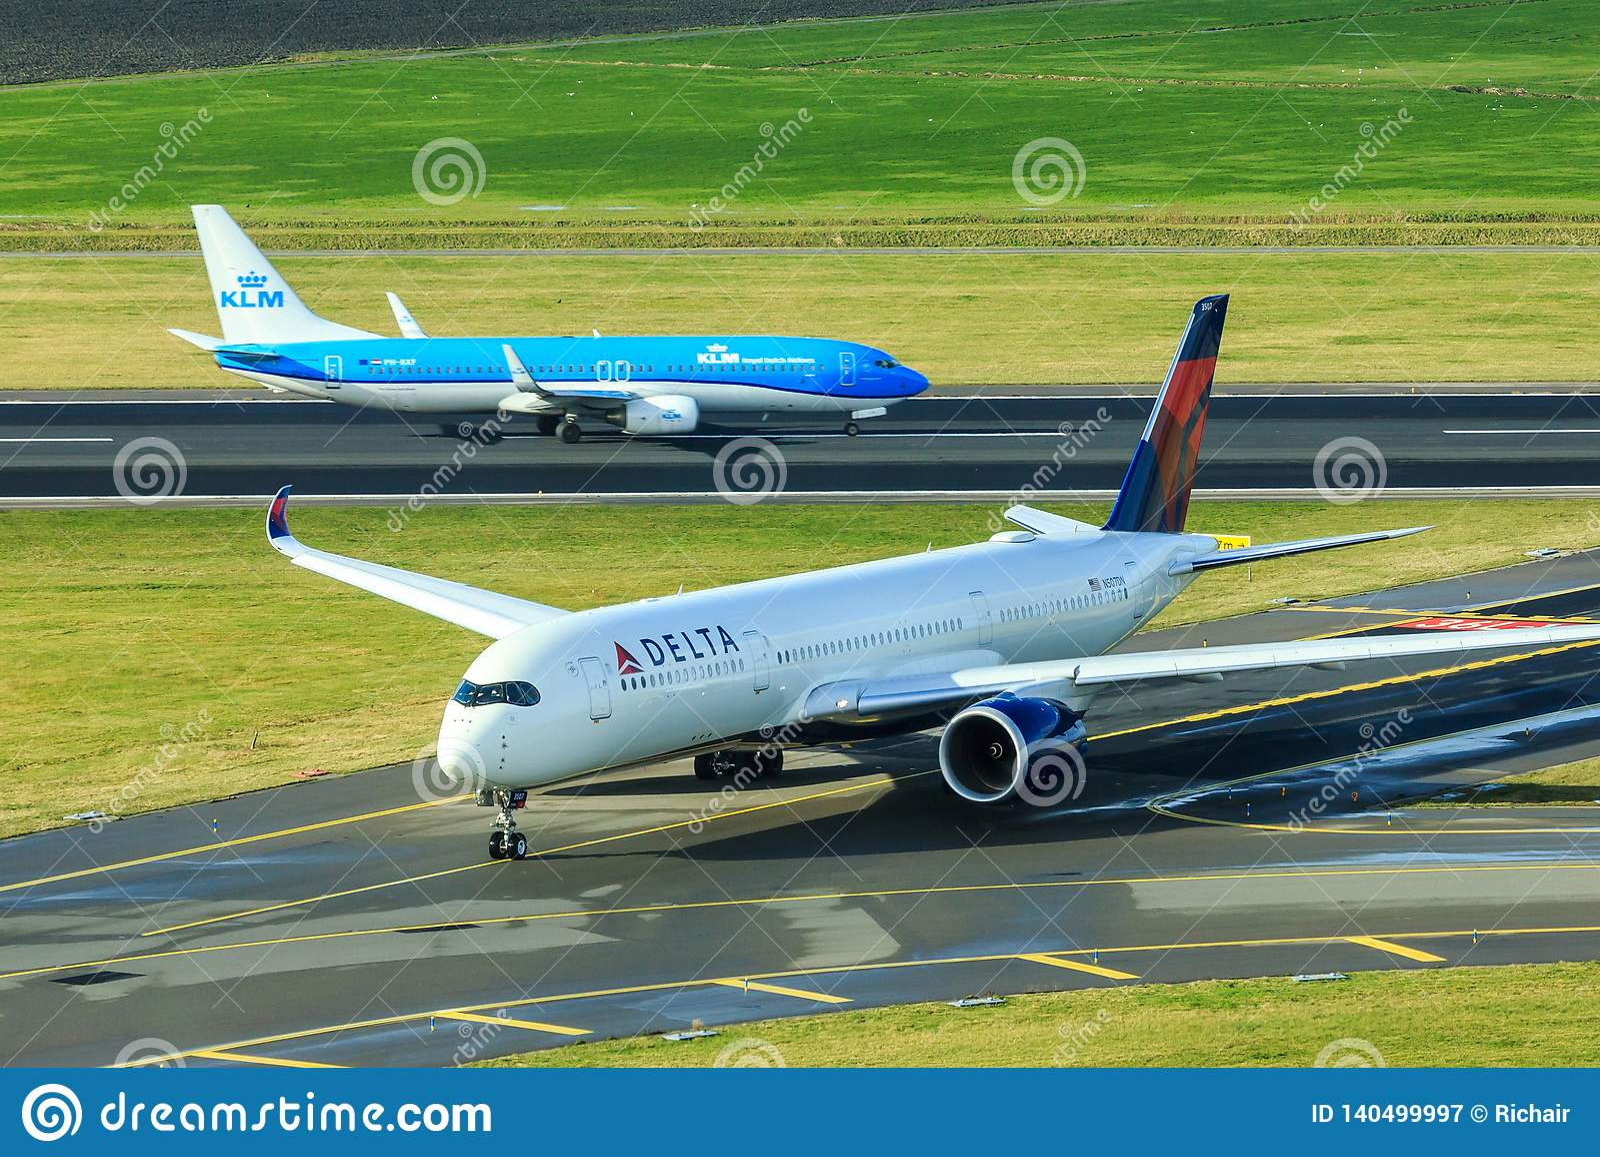 KLM stråle och Delta Airlines stråle